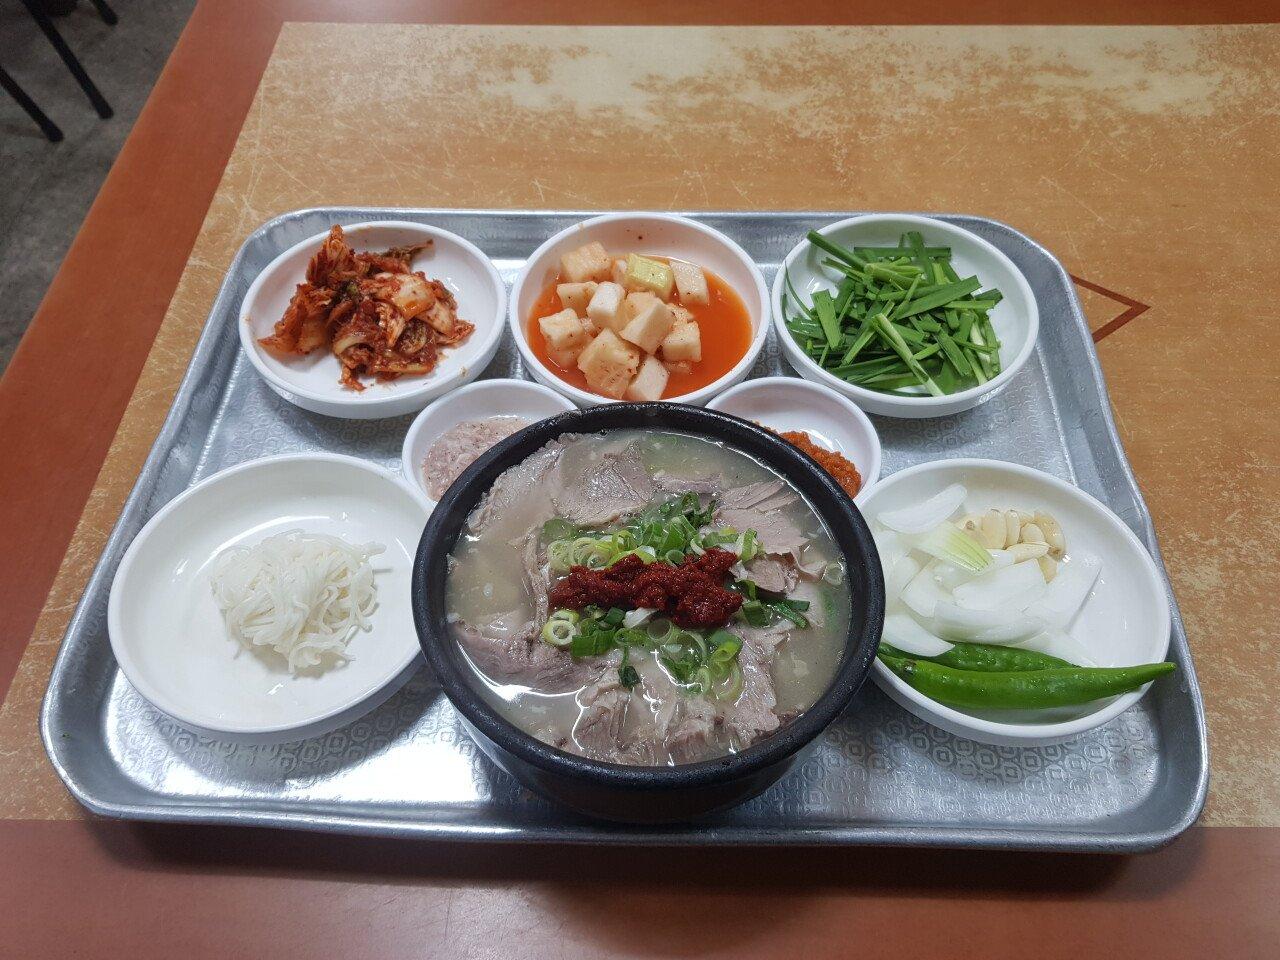 20210630_095043.jpg 부산 갔을때 먹은 국밥